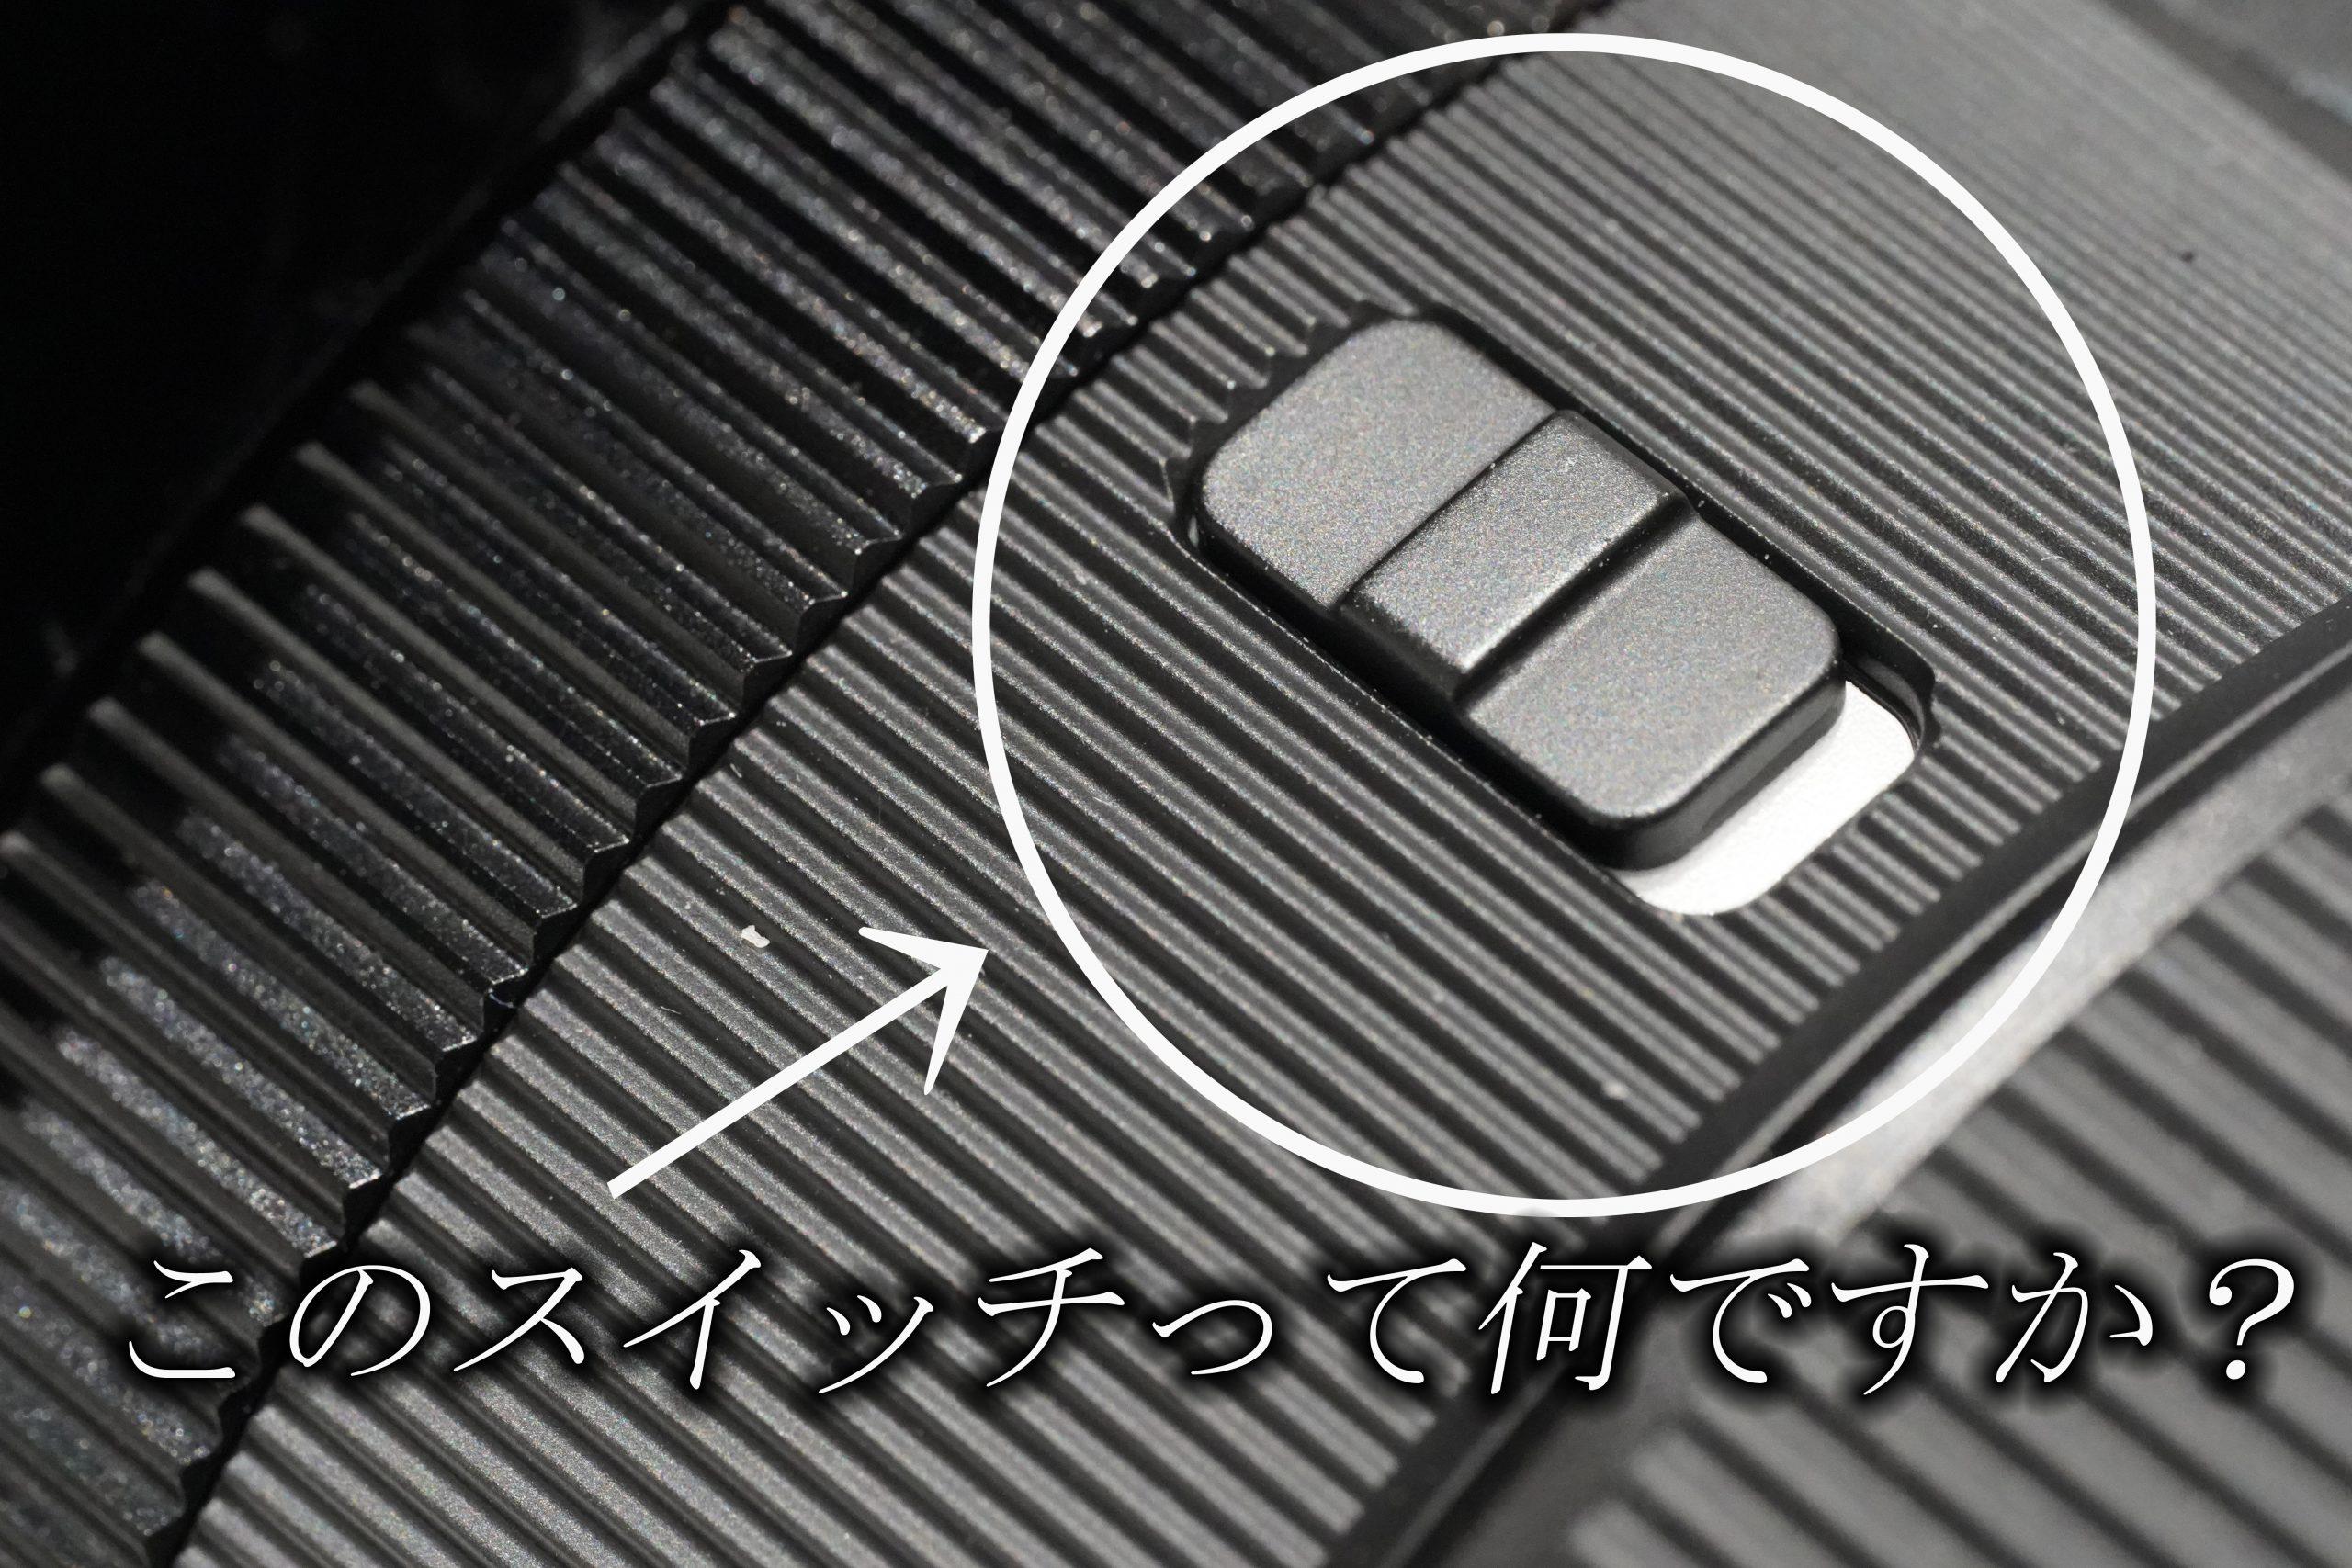 【SIGMA】Camera Technique Vol.15 このスイッチってなに?